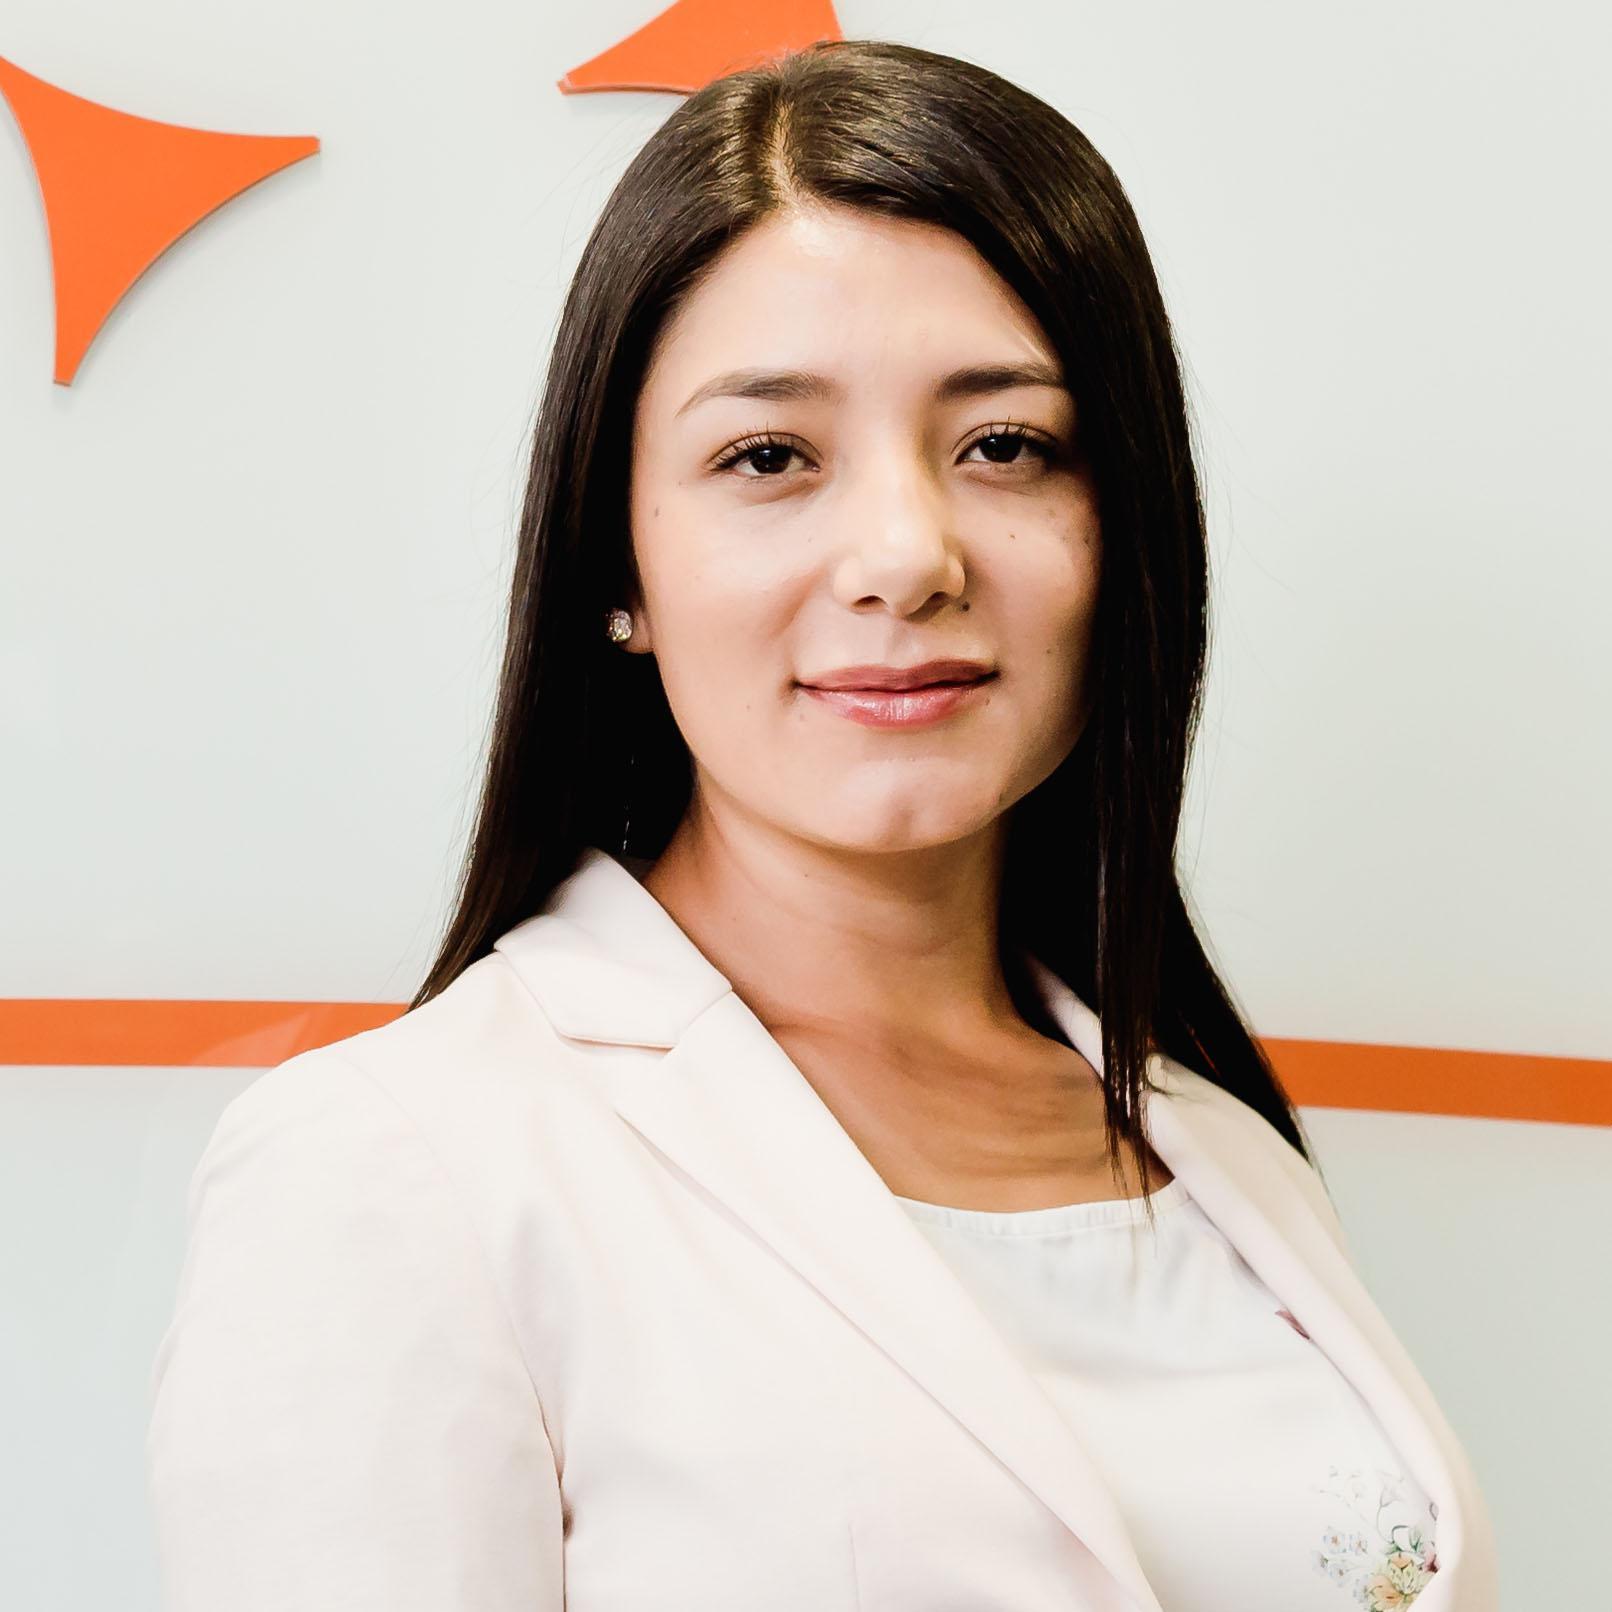 Paola Cardona Hernández